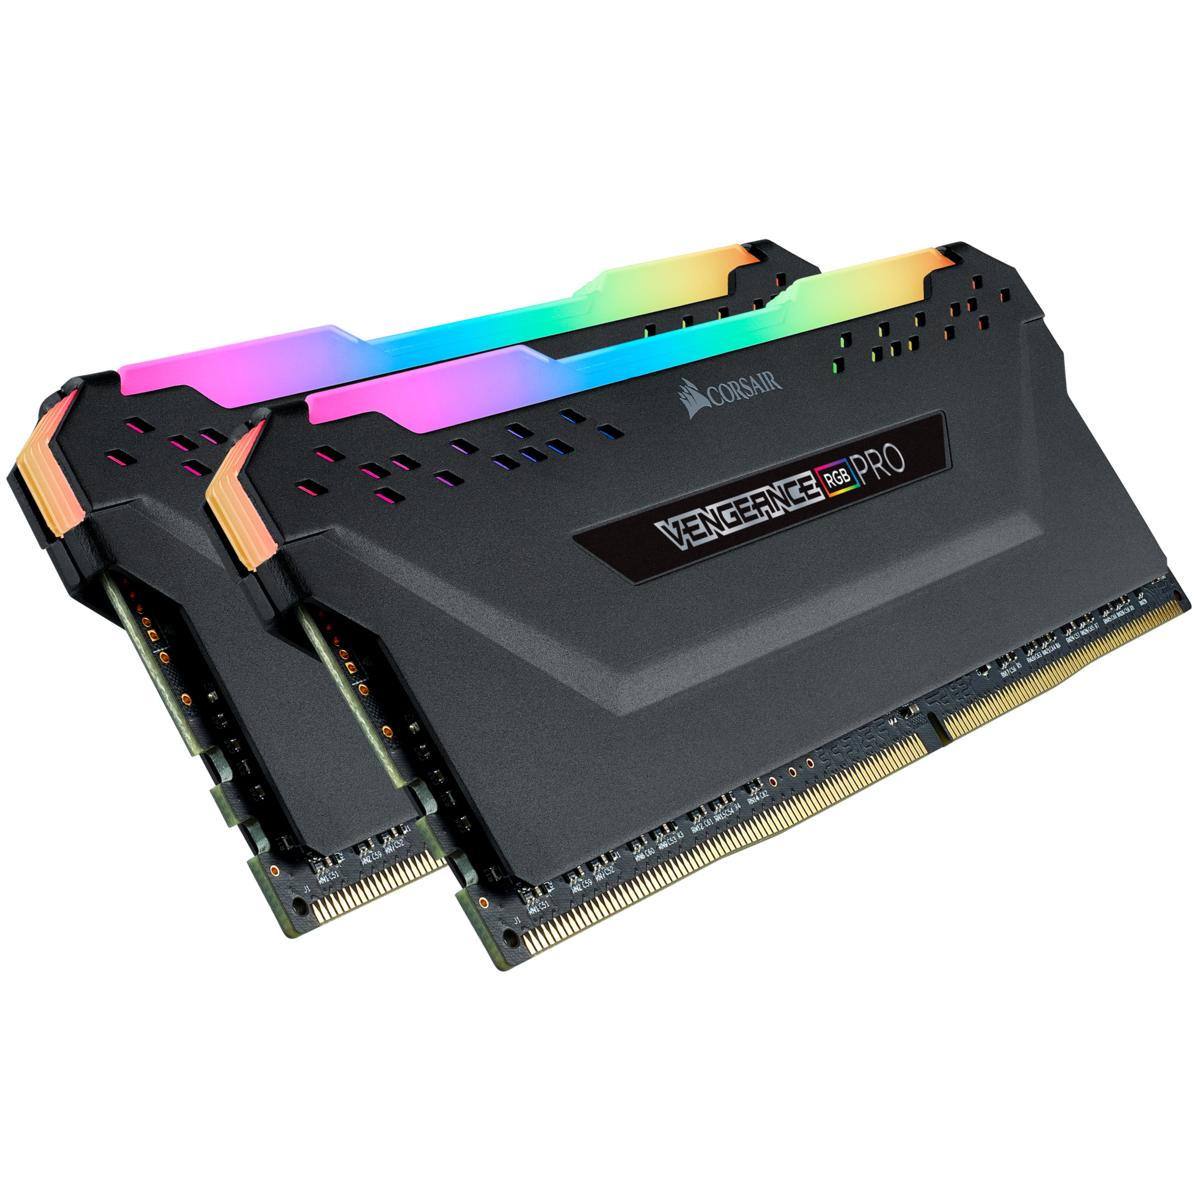 Corsair Vengeance CMW16GX4M2Z3600C18 memory module 16 GB DDR4 3600 MHz